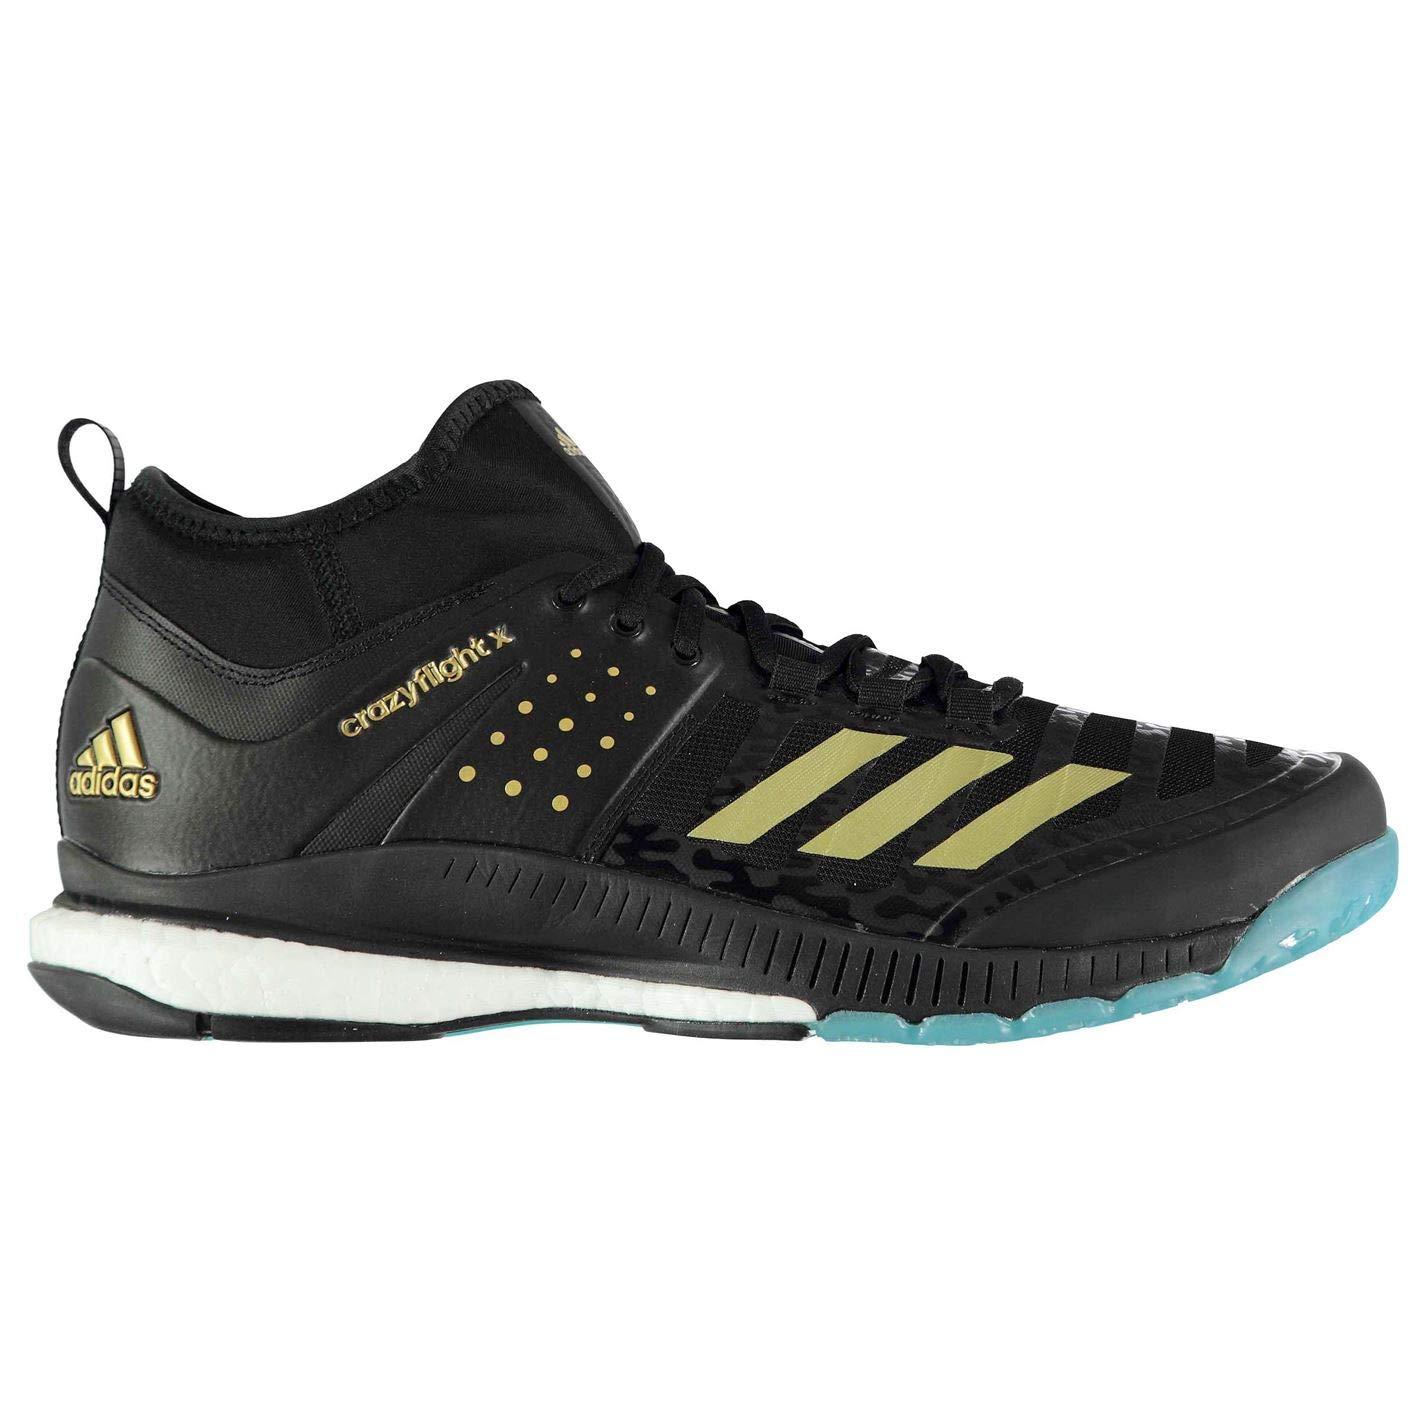 adidas Men's's Crazyflight X Mid Volleyball Shoes (Ftwbla ...